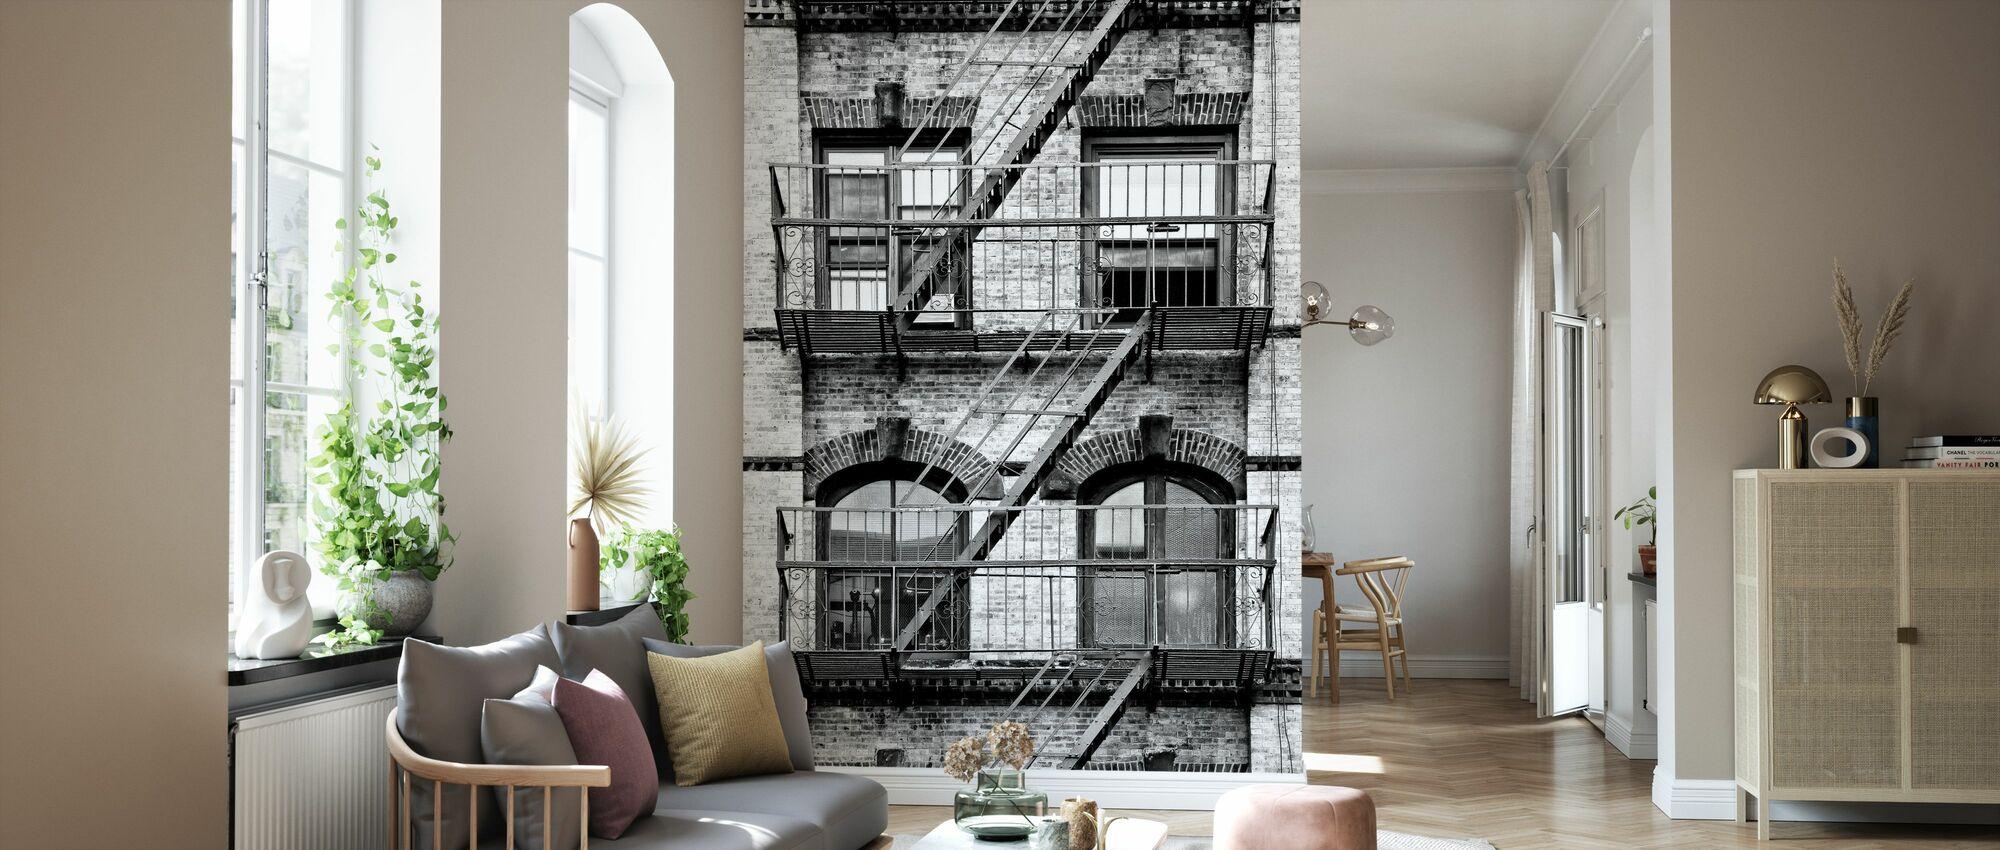 New York Fassade - Tapete - Wohnzimmer